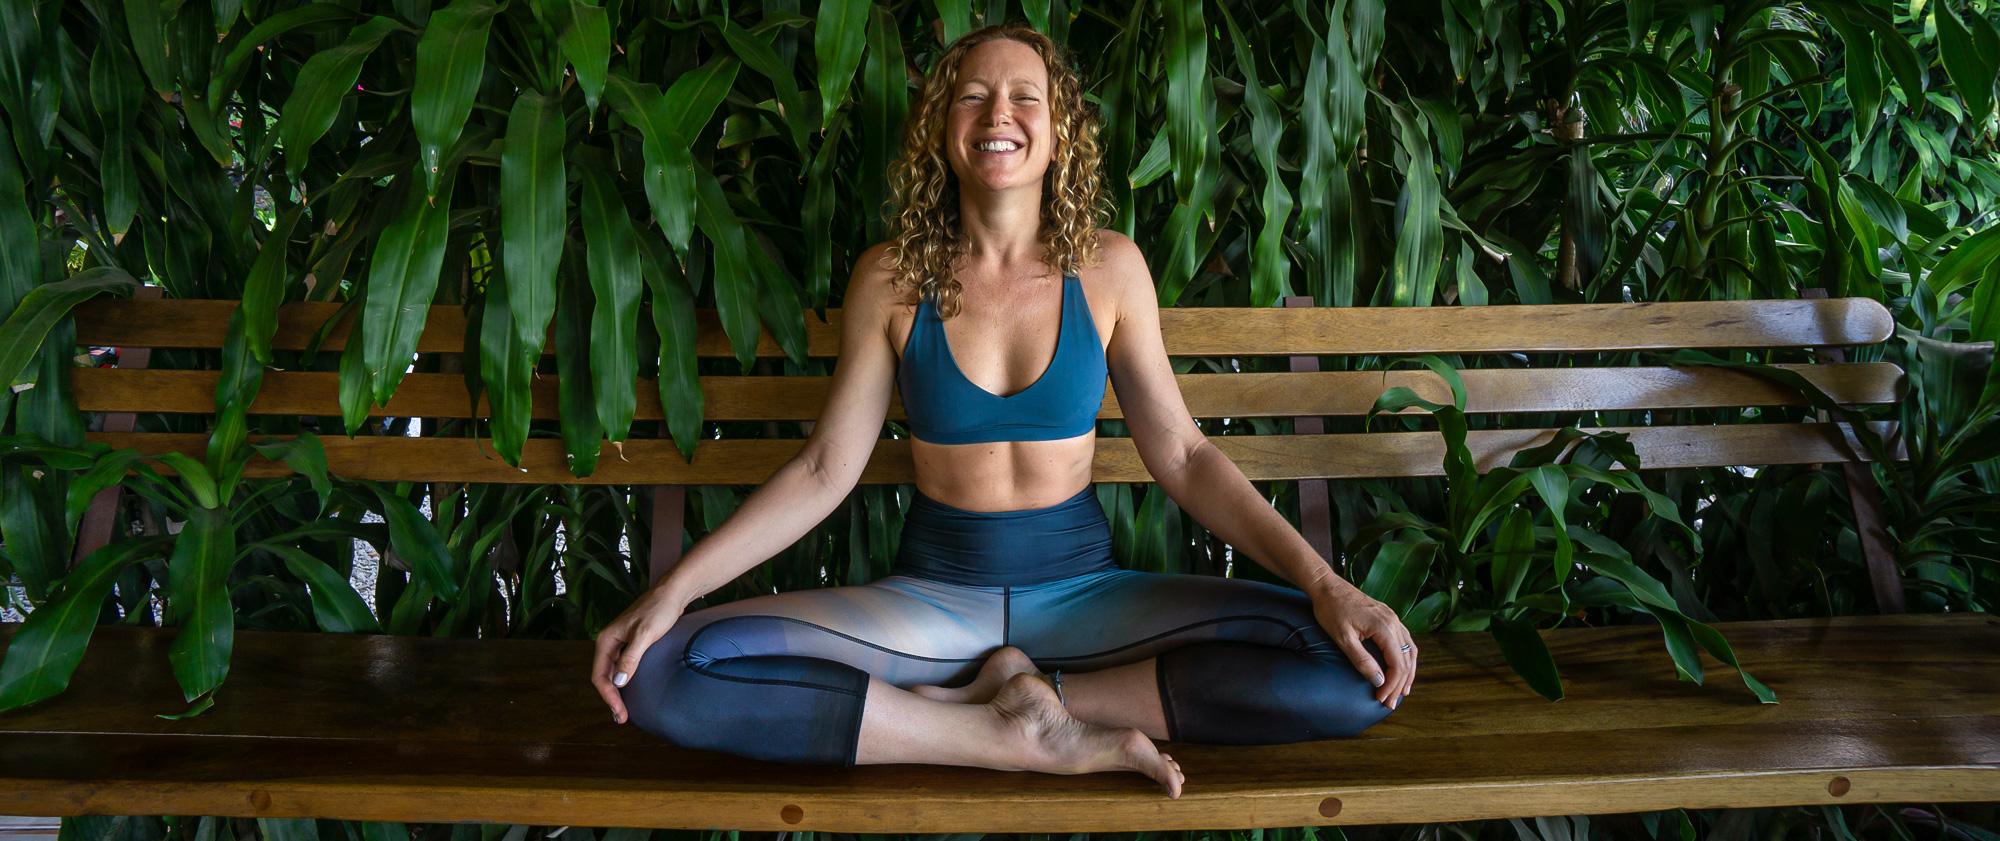 photo-horiz-aligned-flow-yoga-bio-bench-smile.jpg